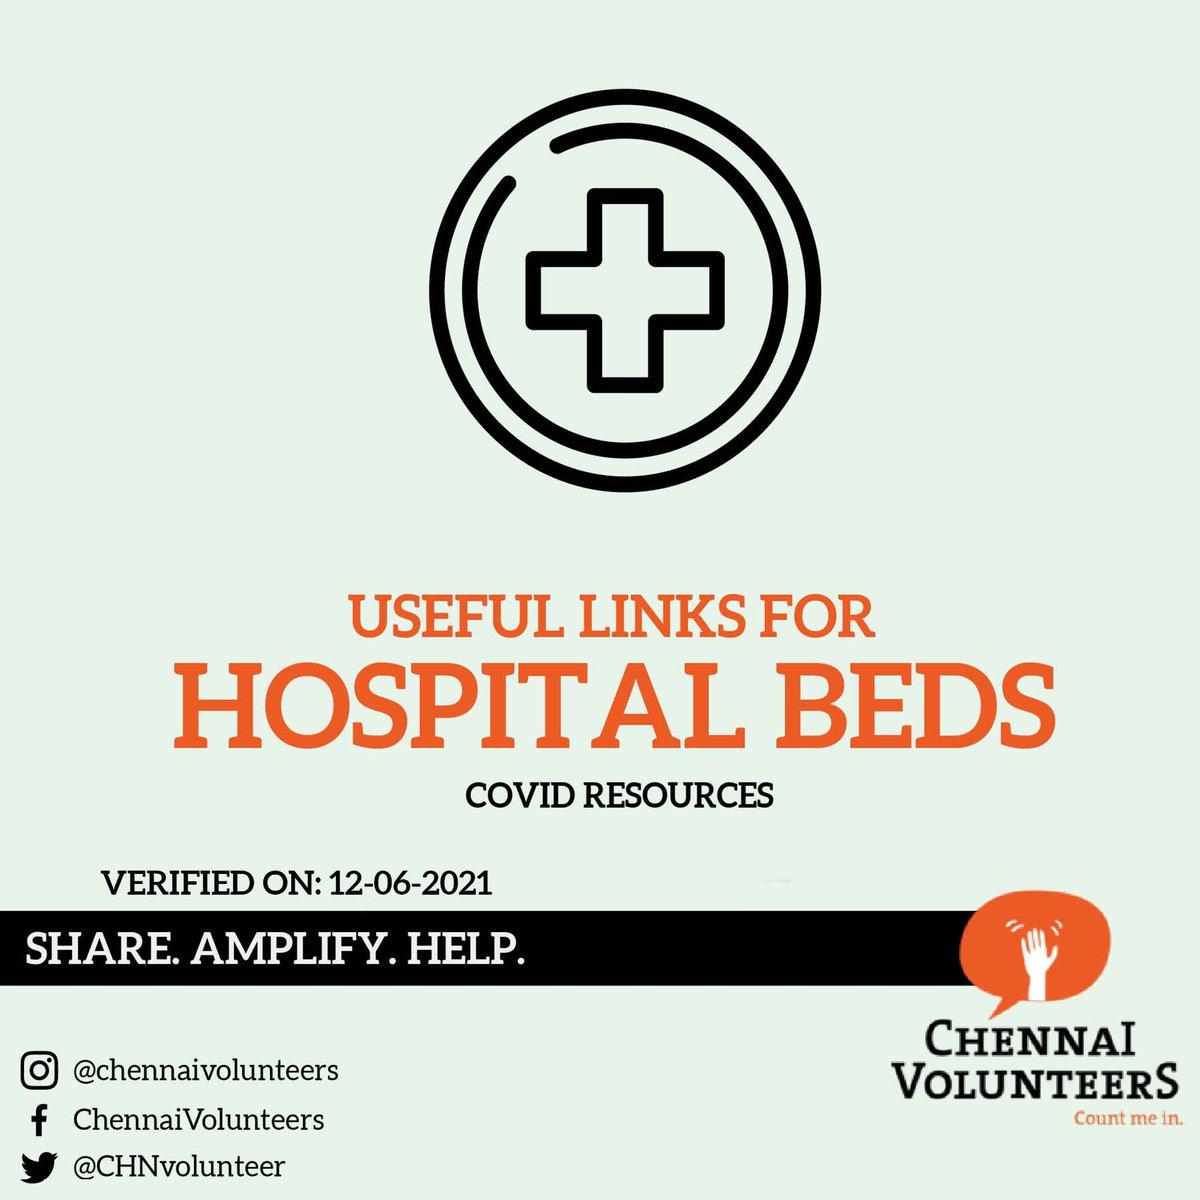 Here's an updated and verified list of helplines offering hospital beds availability status in Tamilnadu #covidindia #CovidHelp #Covidaid #ChennaiVolunteers #chennai #Tamilnadu #StayHomeStaySafe #CovidSupport #CovidResource #Covidsos #covidhelpindia #covidhelpline #hospitalbeds https://t.co/CPkcz7VIa0